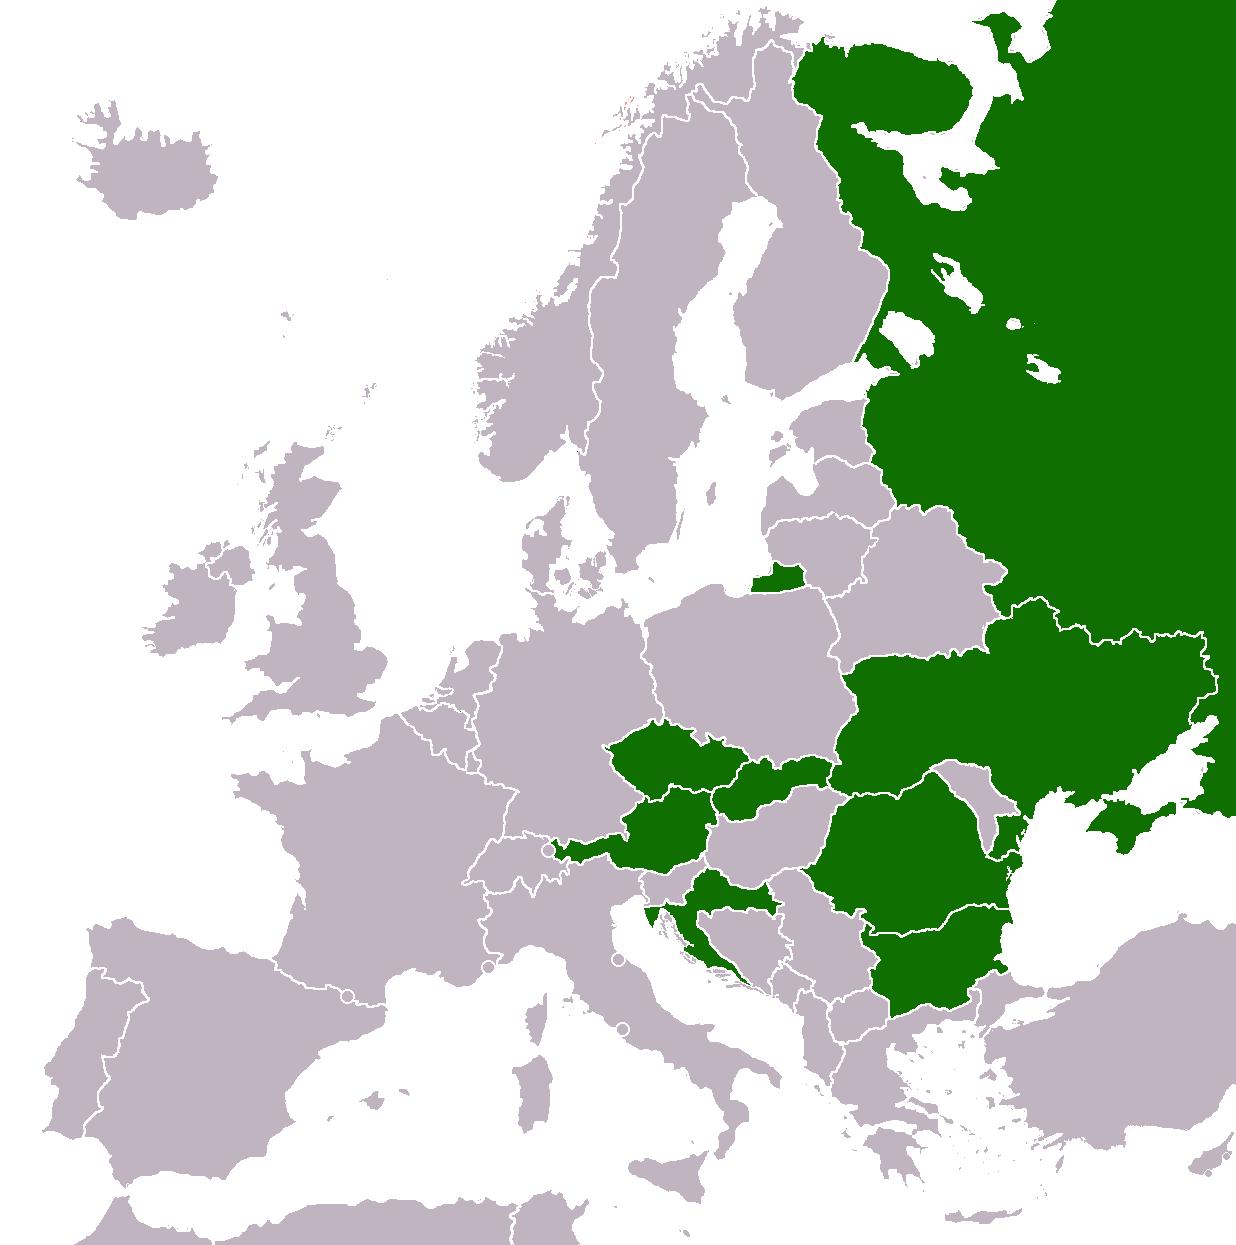 Billa in Europe